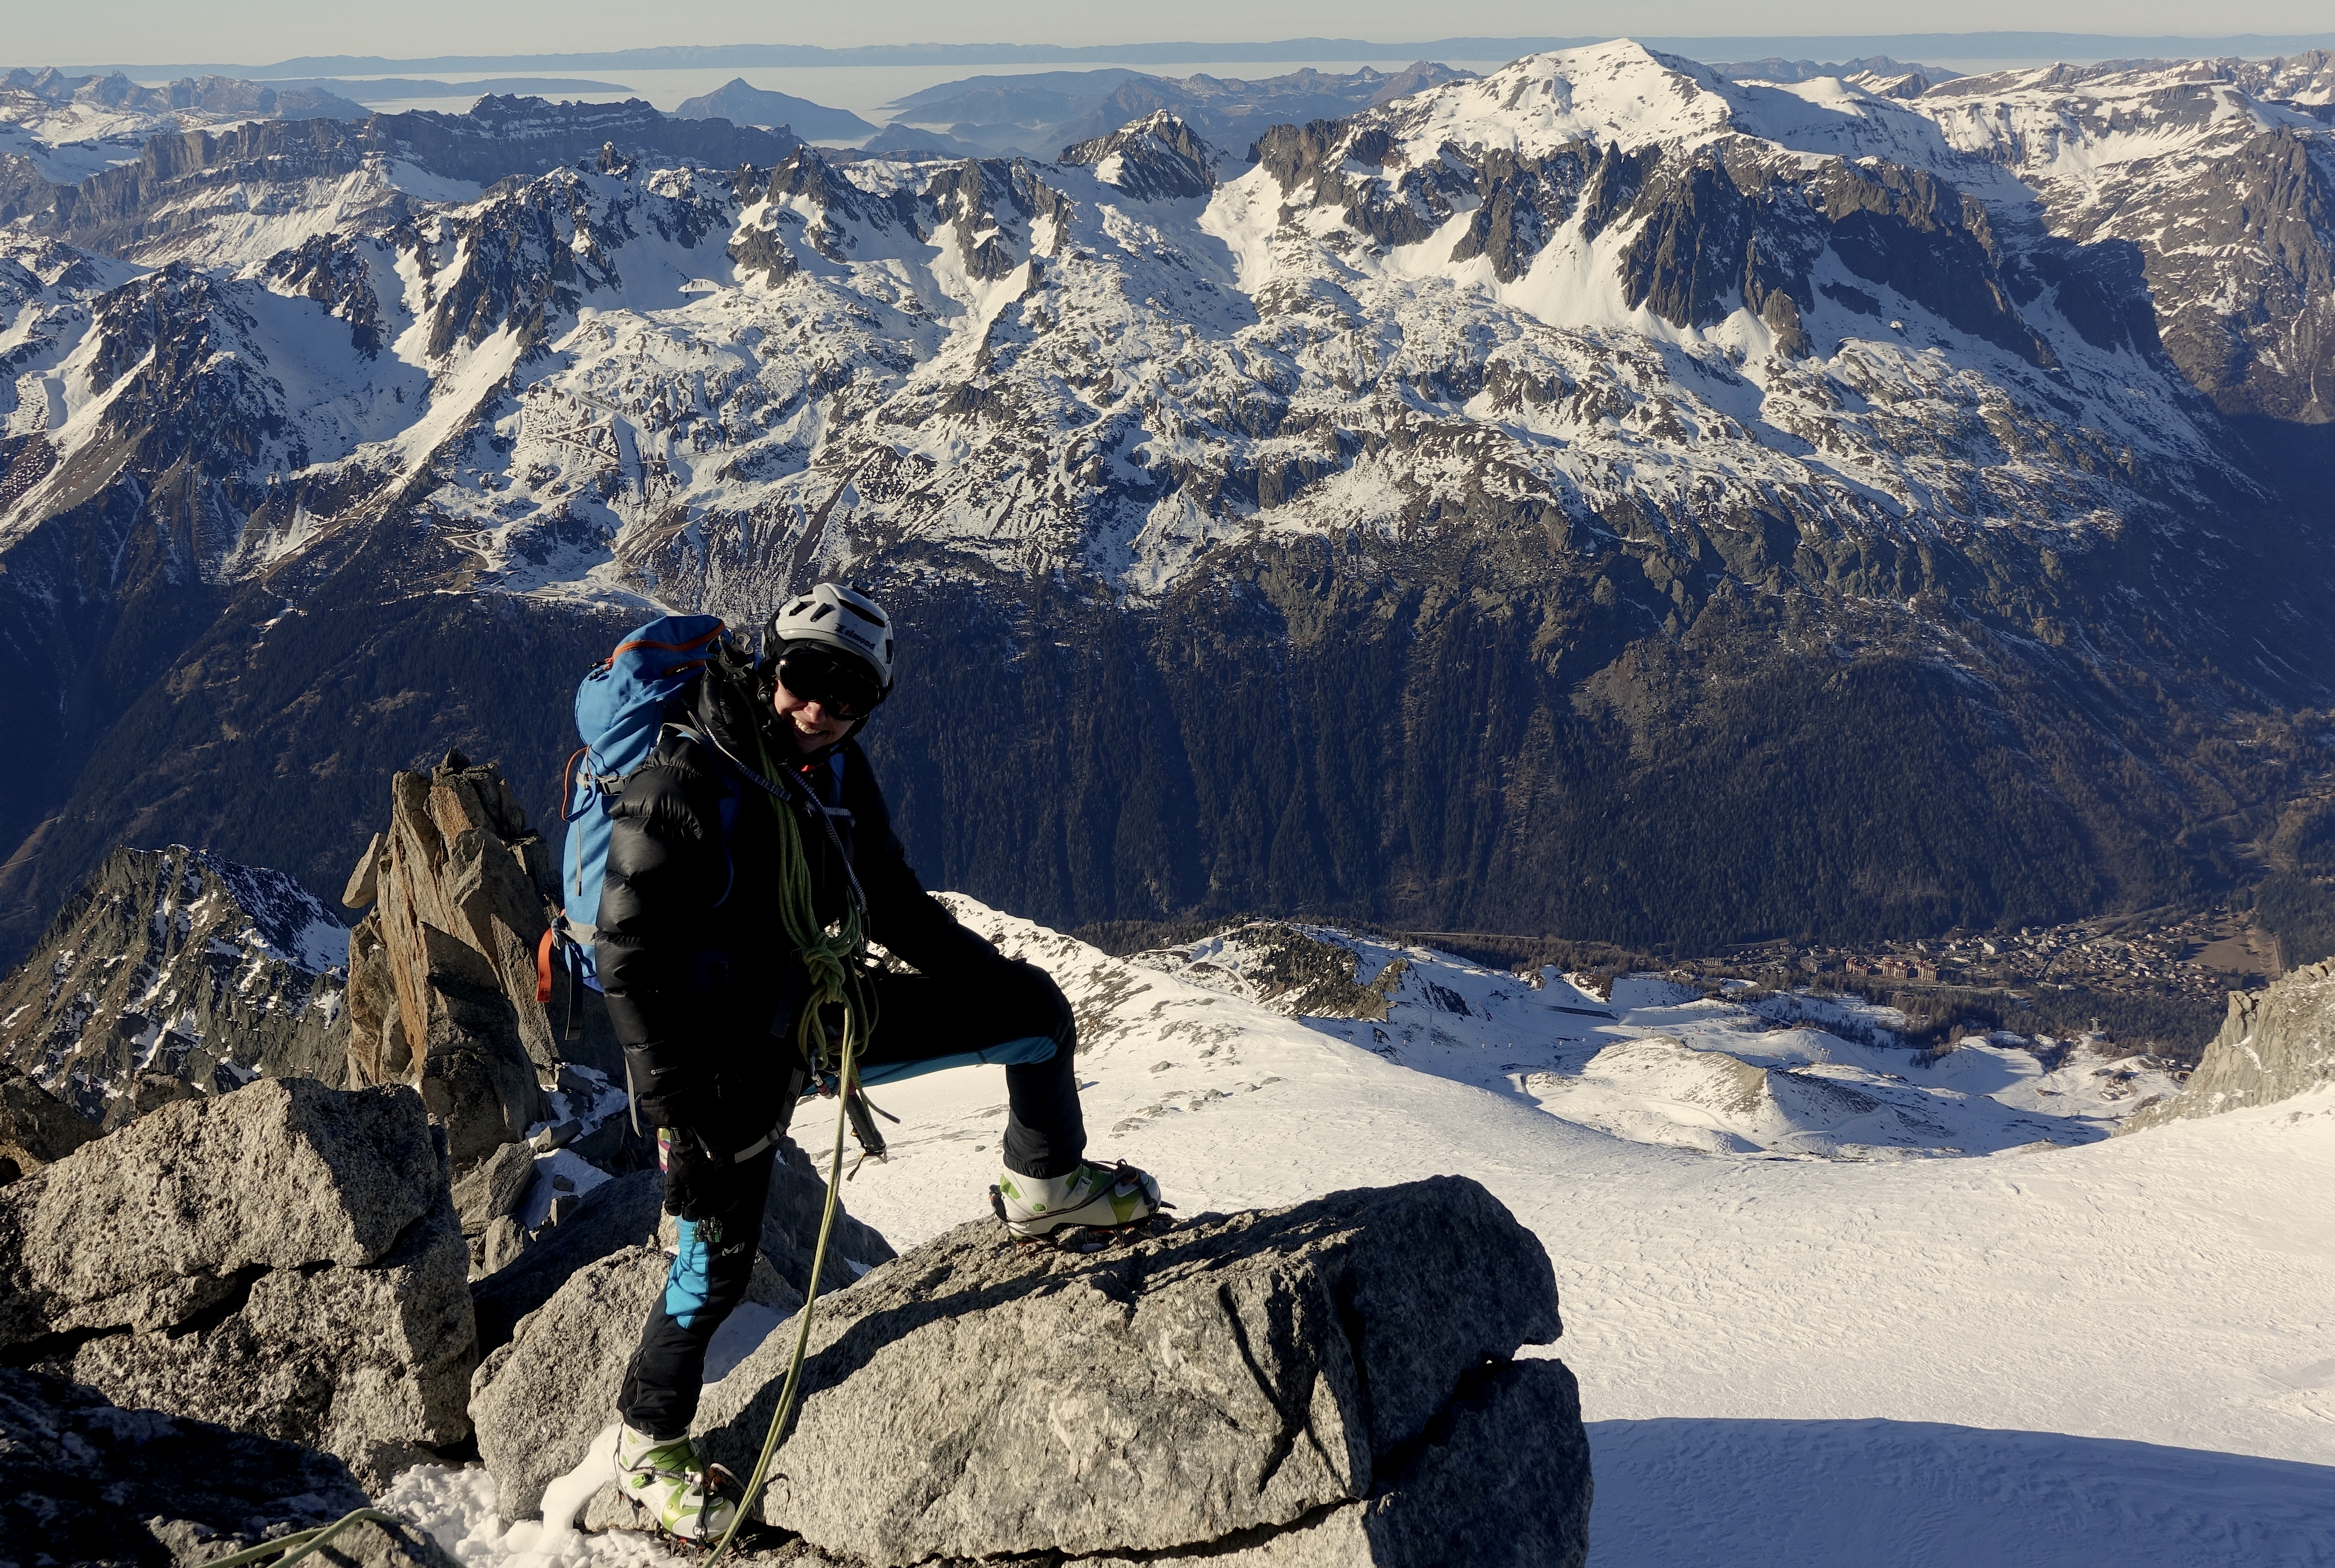 Climbing on Aig. Verte, Chamonix - Mont Blanc, 31.12.2016 (Foto: Felix Berg)